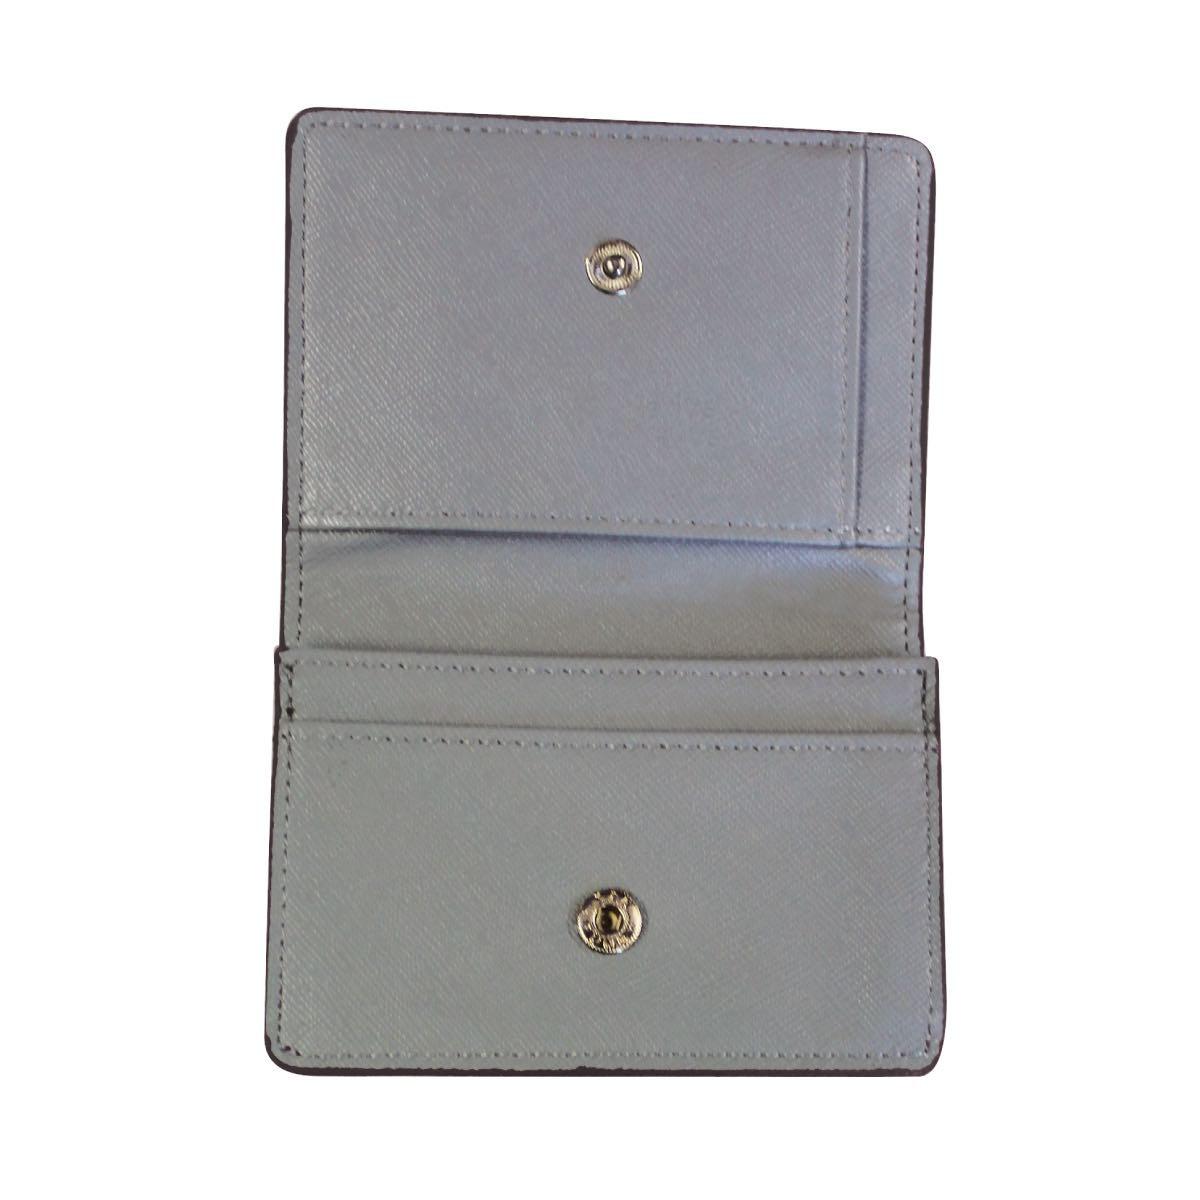 Card Wallet-Raven Box by Allan Weir-3